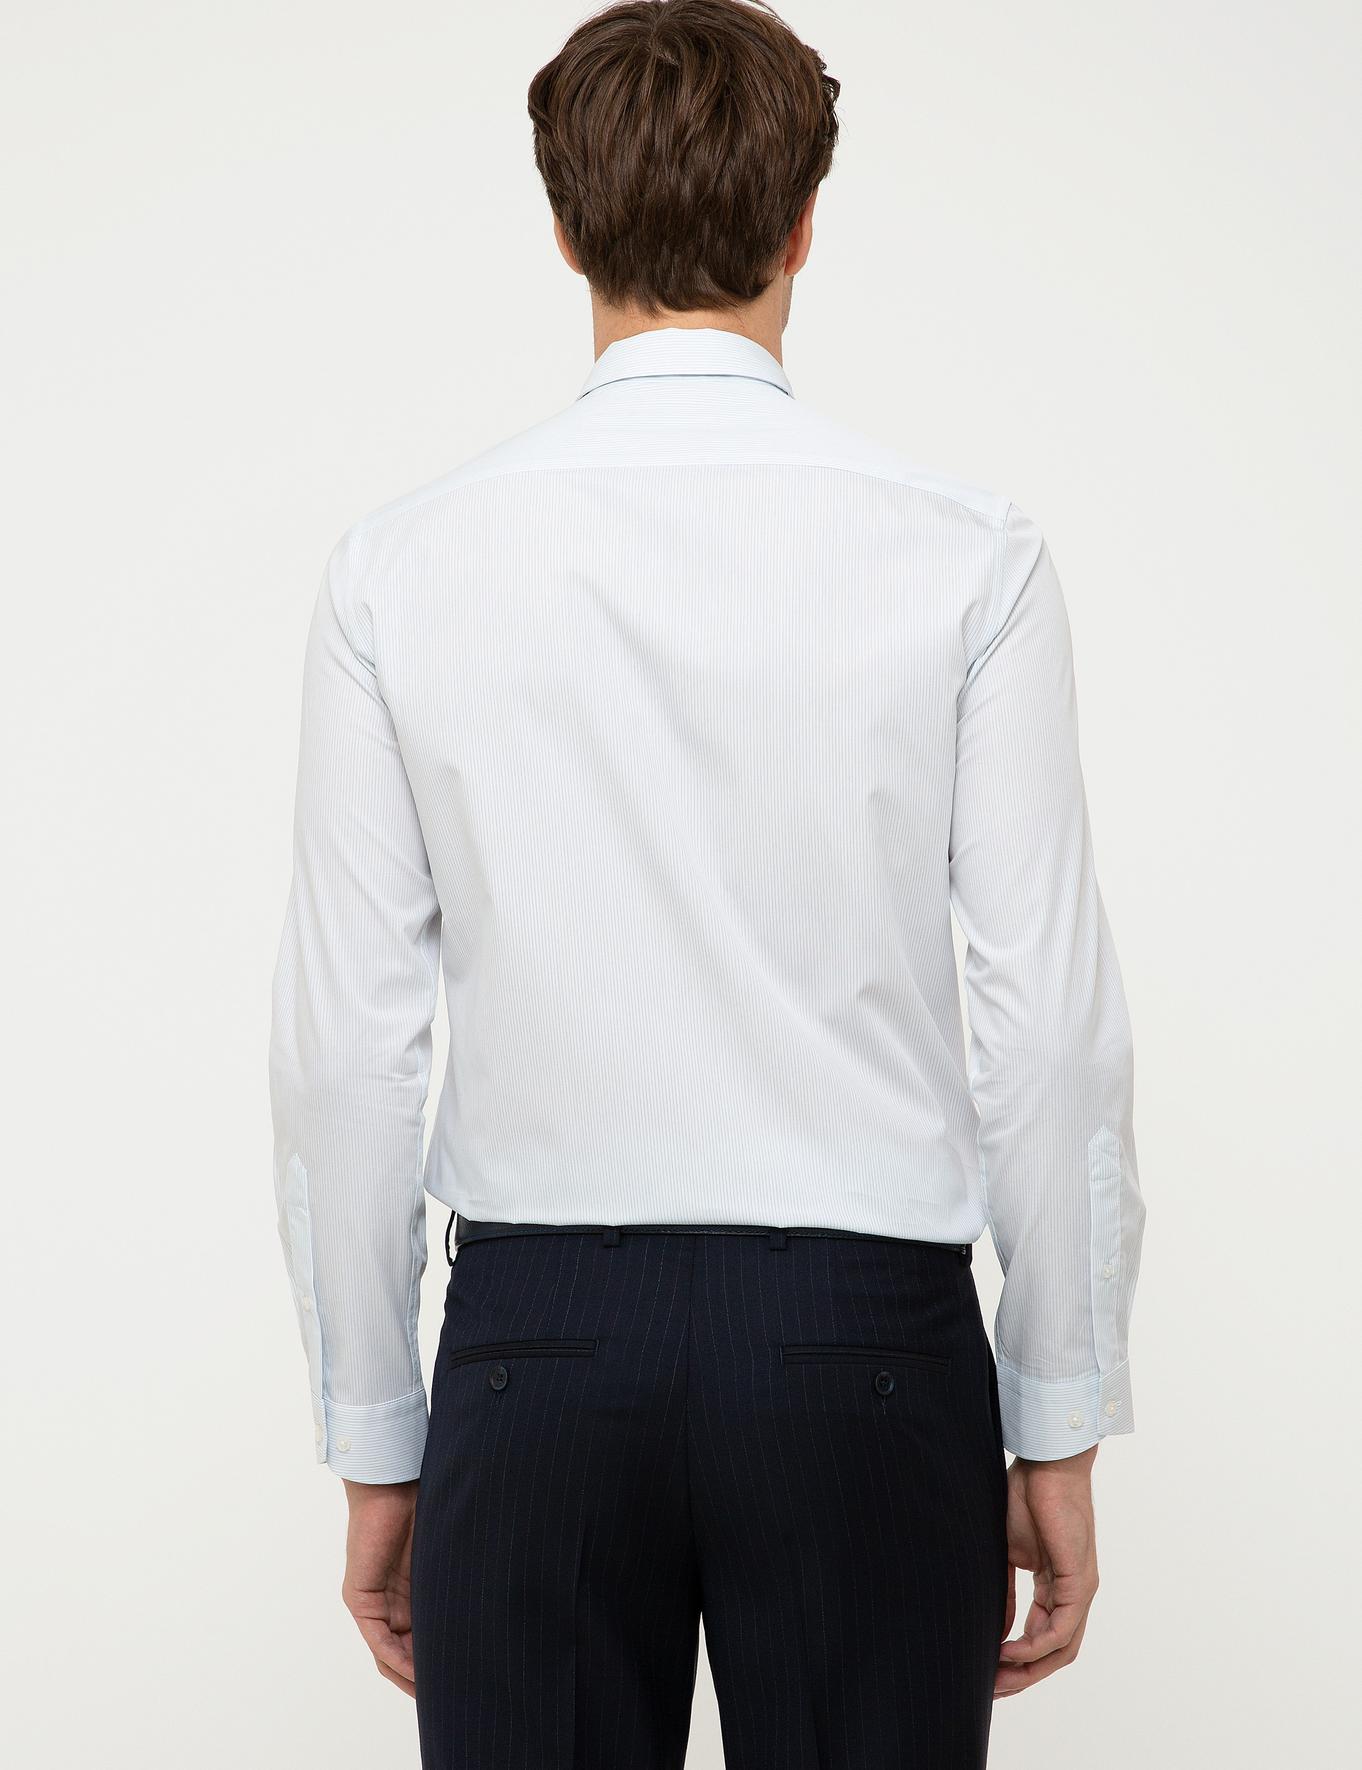 Açık Mavi Slim Fit Gömlek - 50218142005